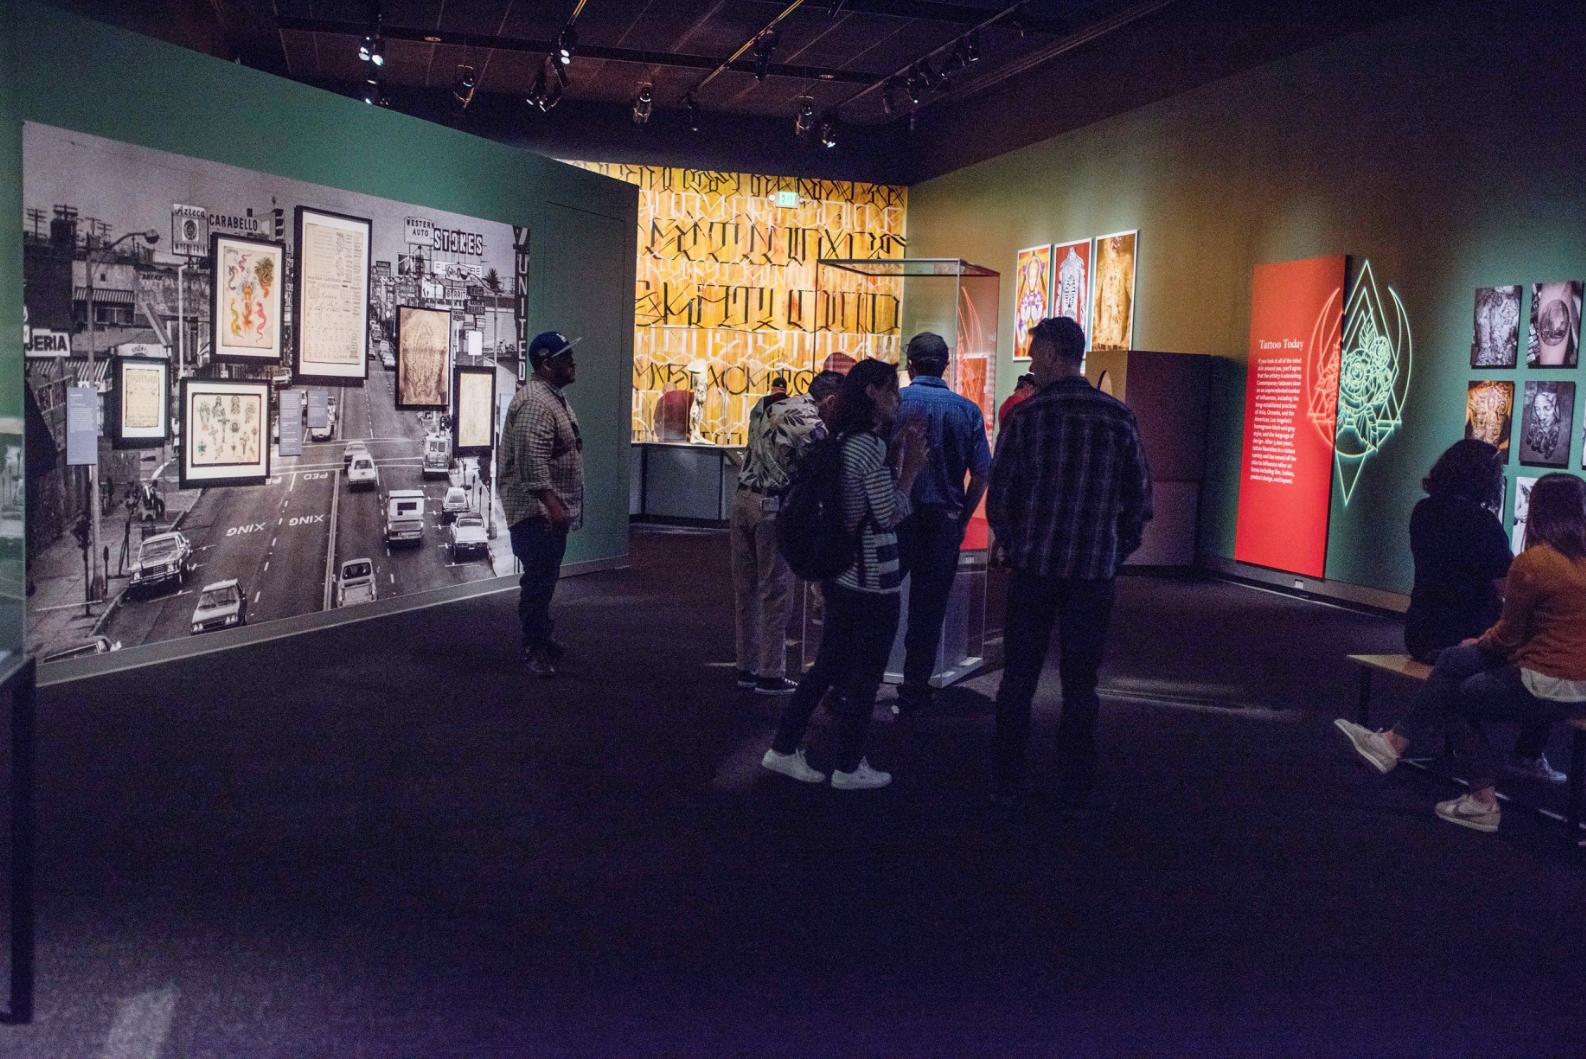 Natural History Museum Tattoo Exhibit